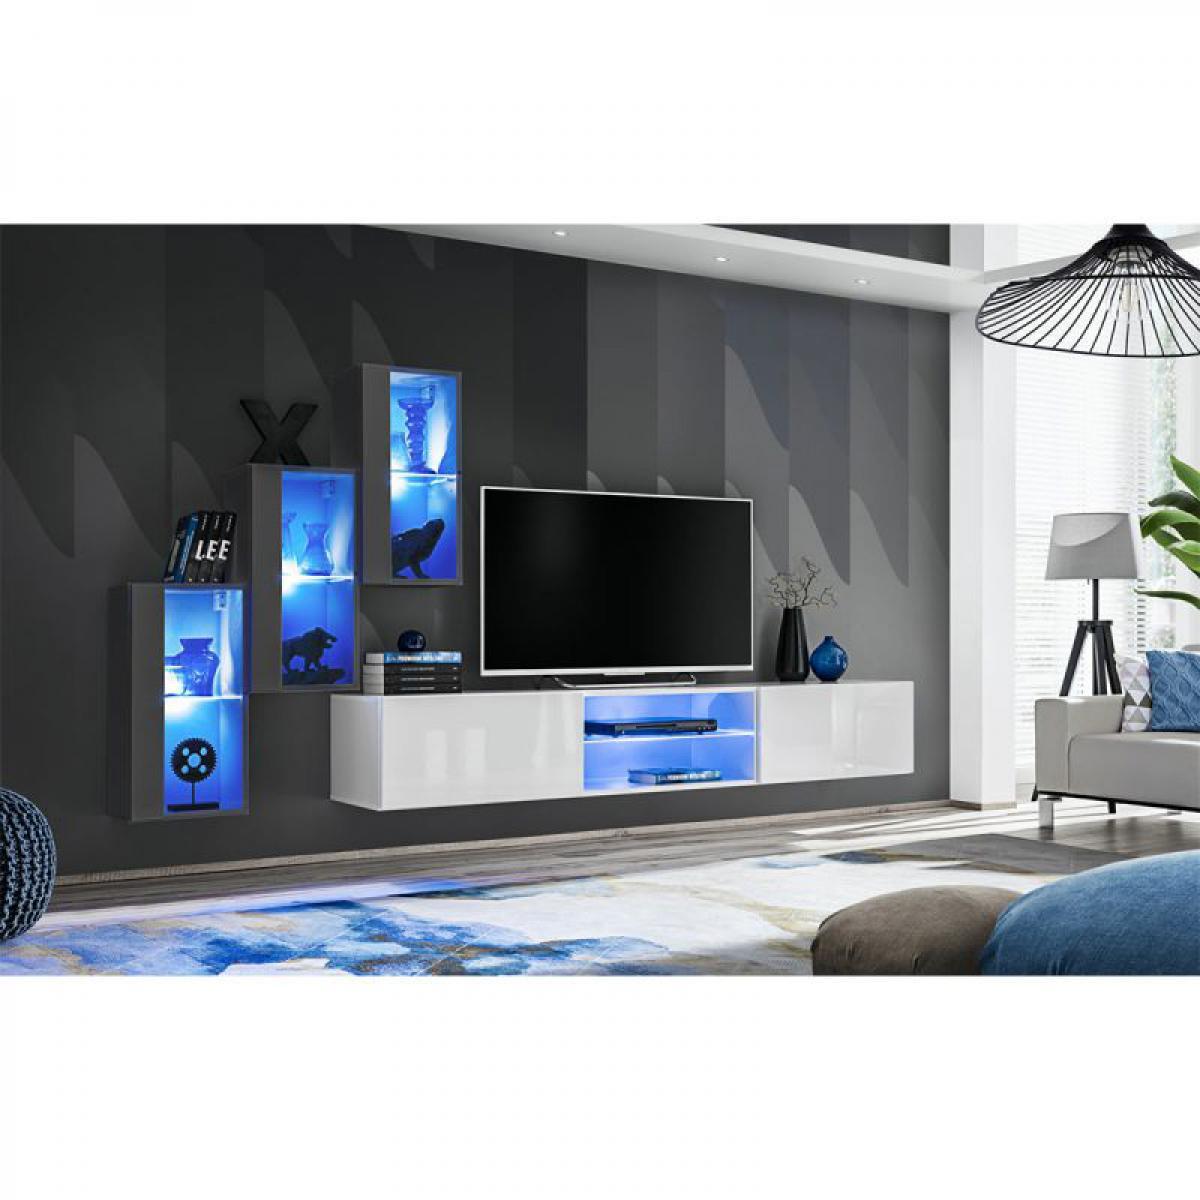 Ac-Deco Ensemble Meuble TV Switch XXII 240cm Gris & Blanc